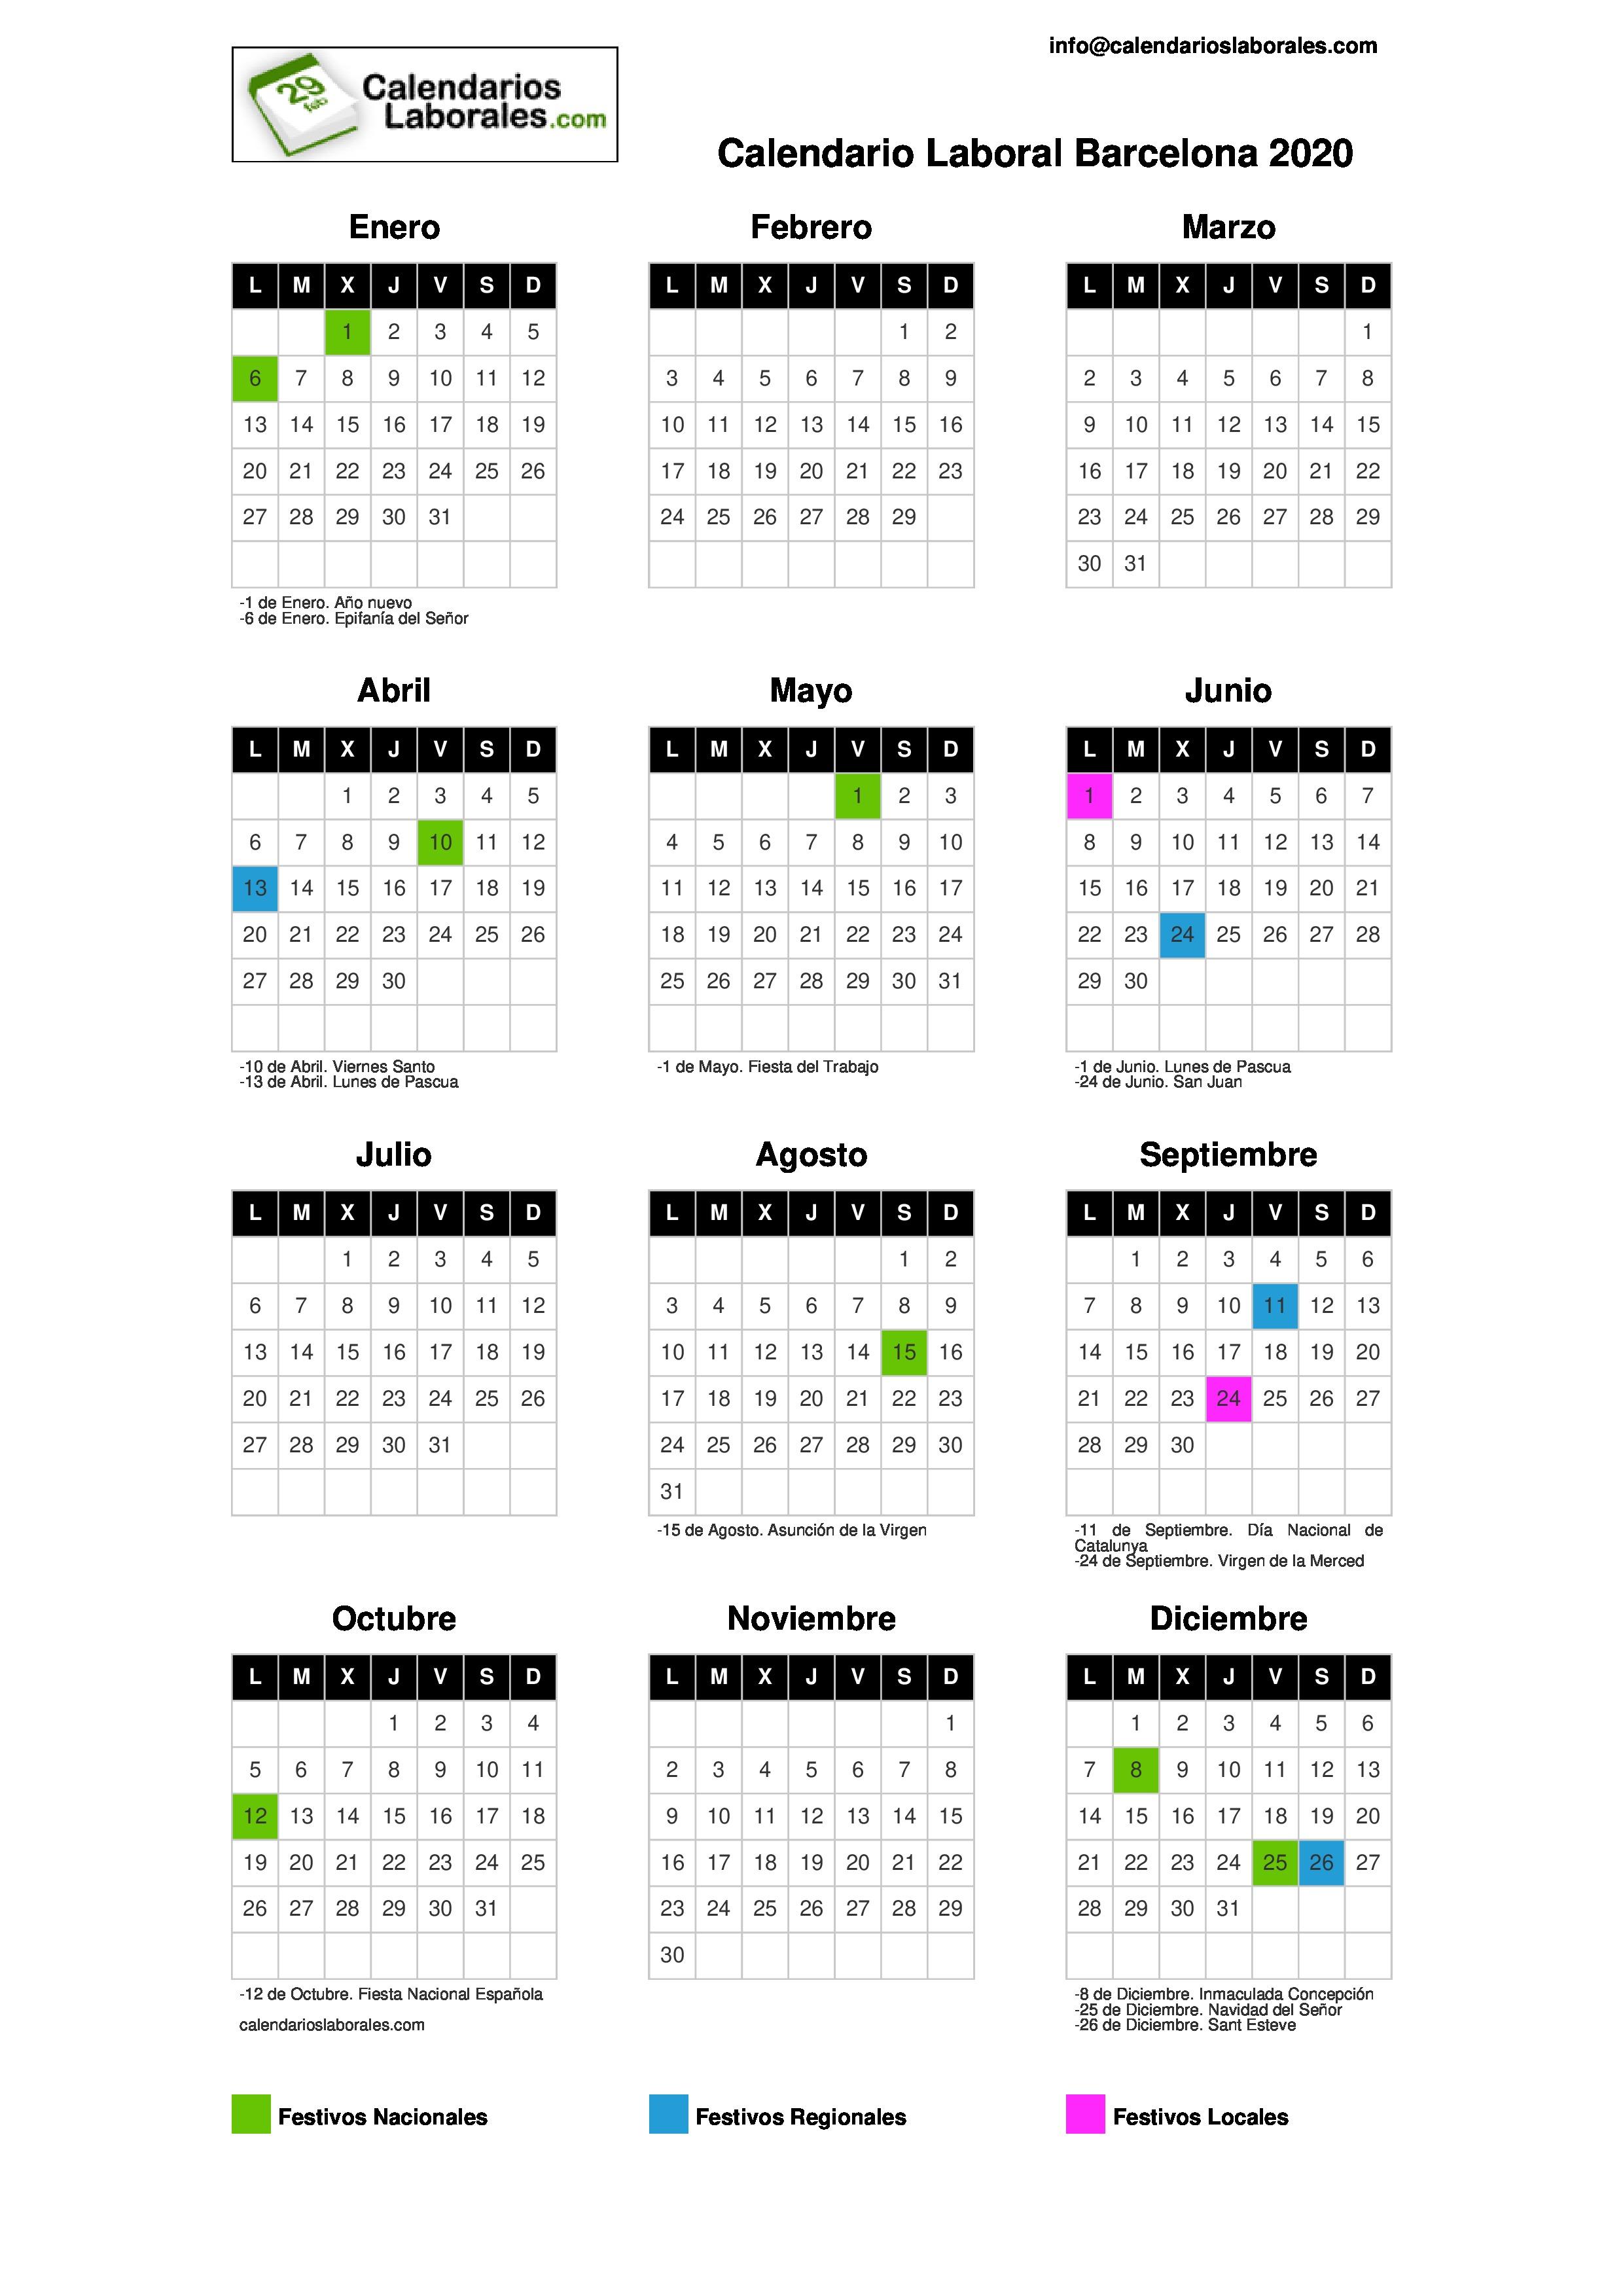 Calendario Laboral Barcelona 2020.Calendario Laboral Barcelona 2020